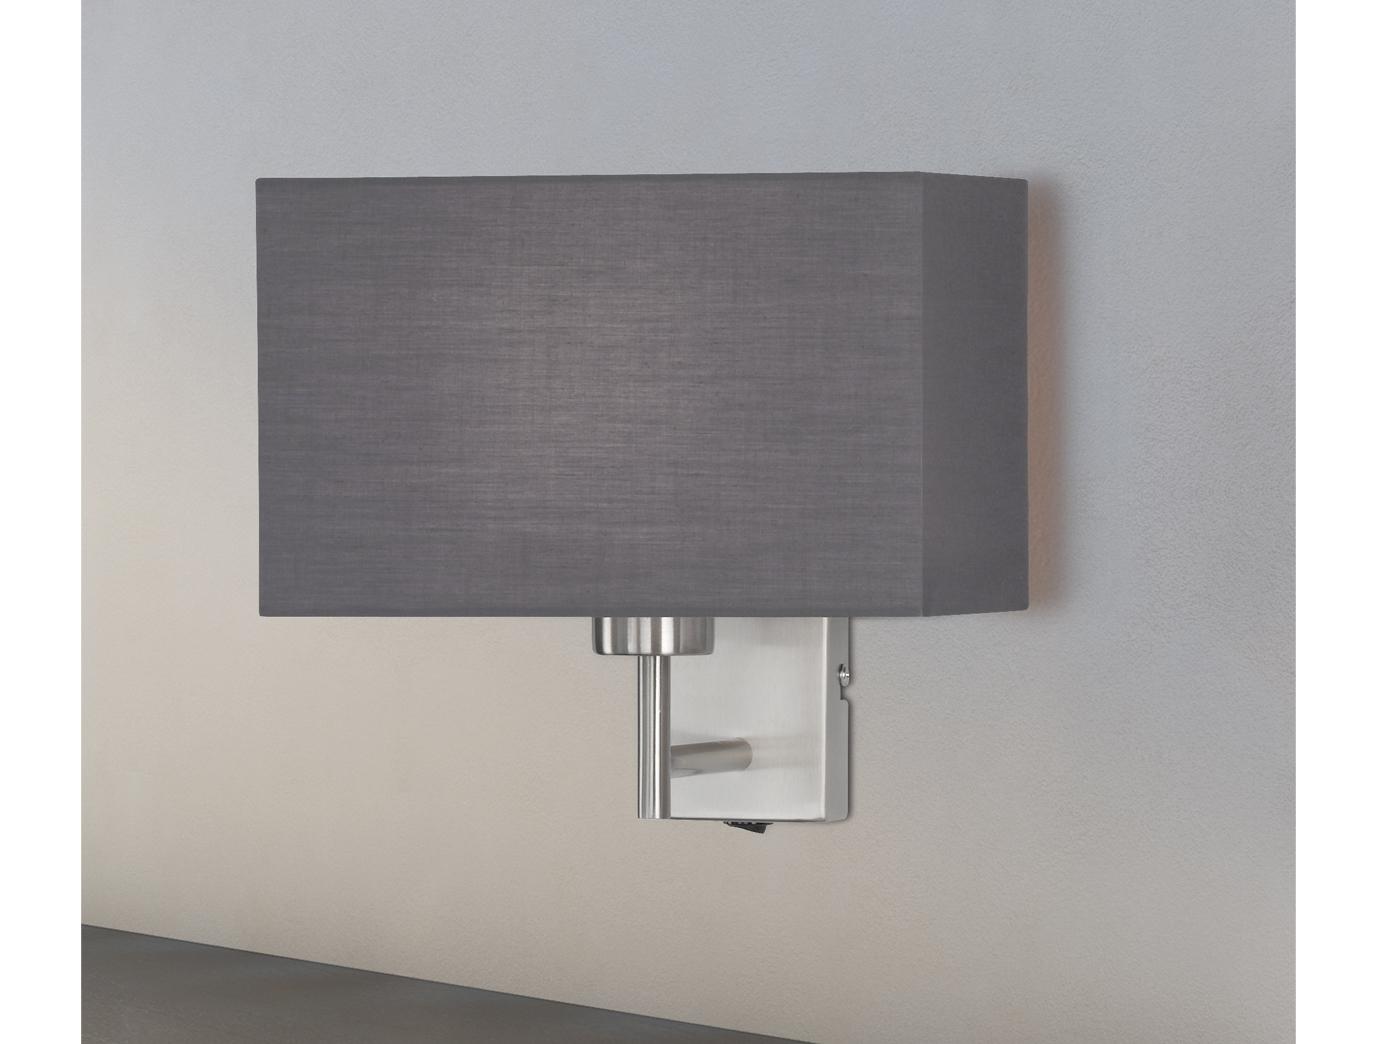 Lampada led da muro lampada da visita a led da parete flessibile